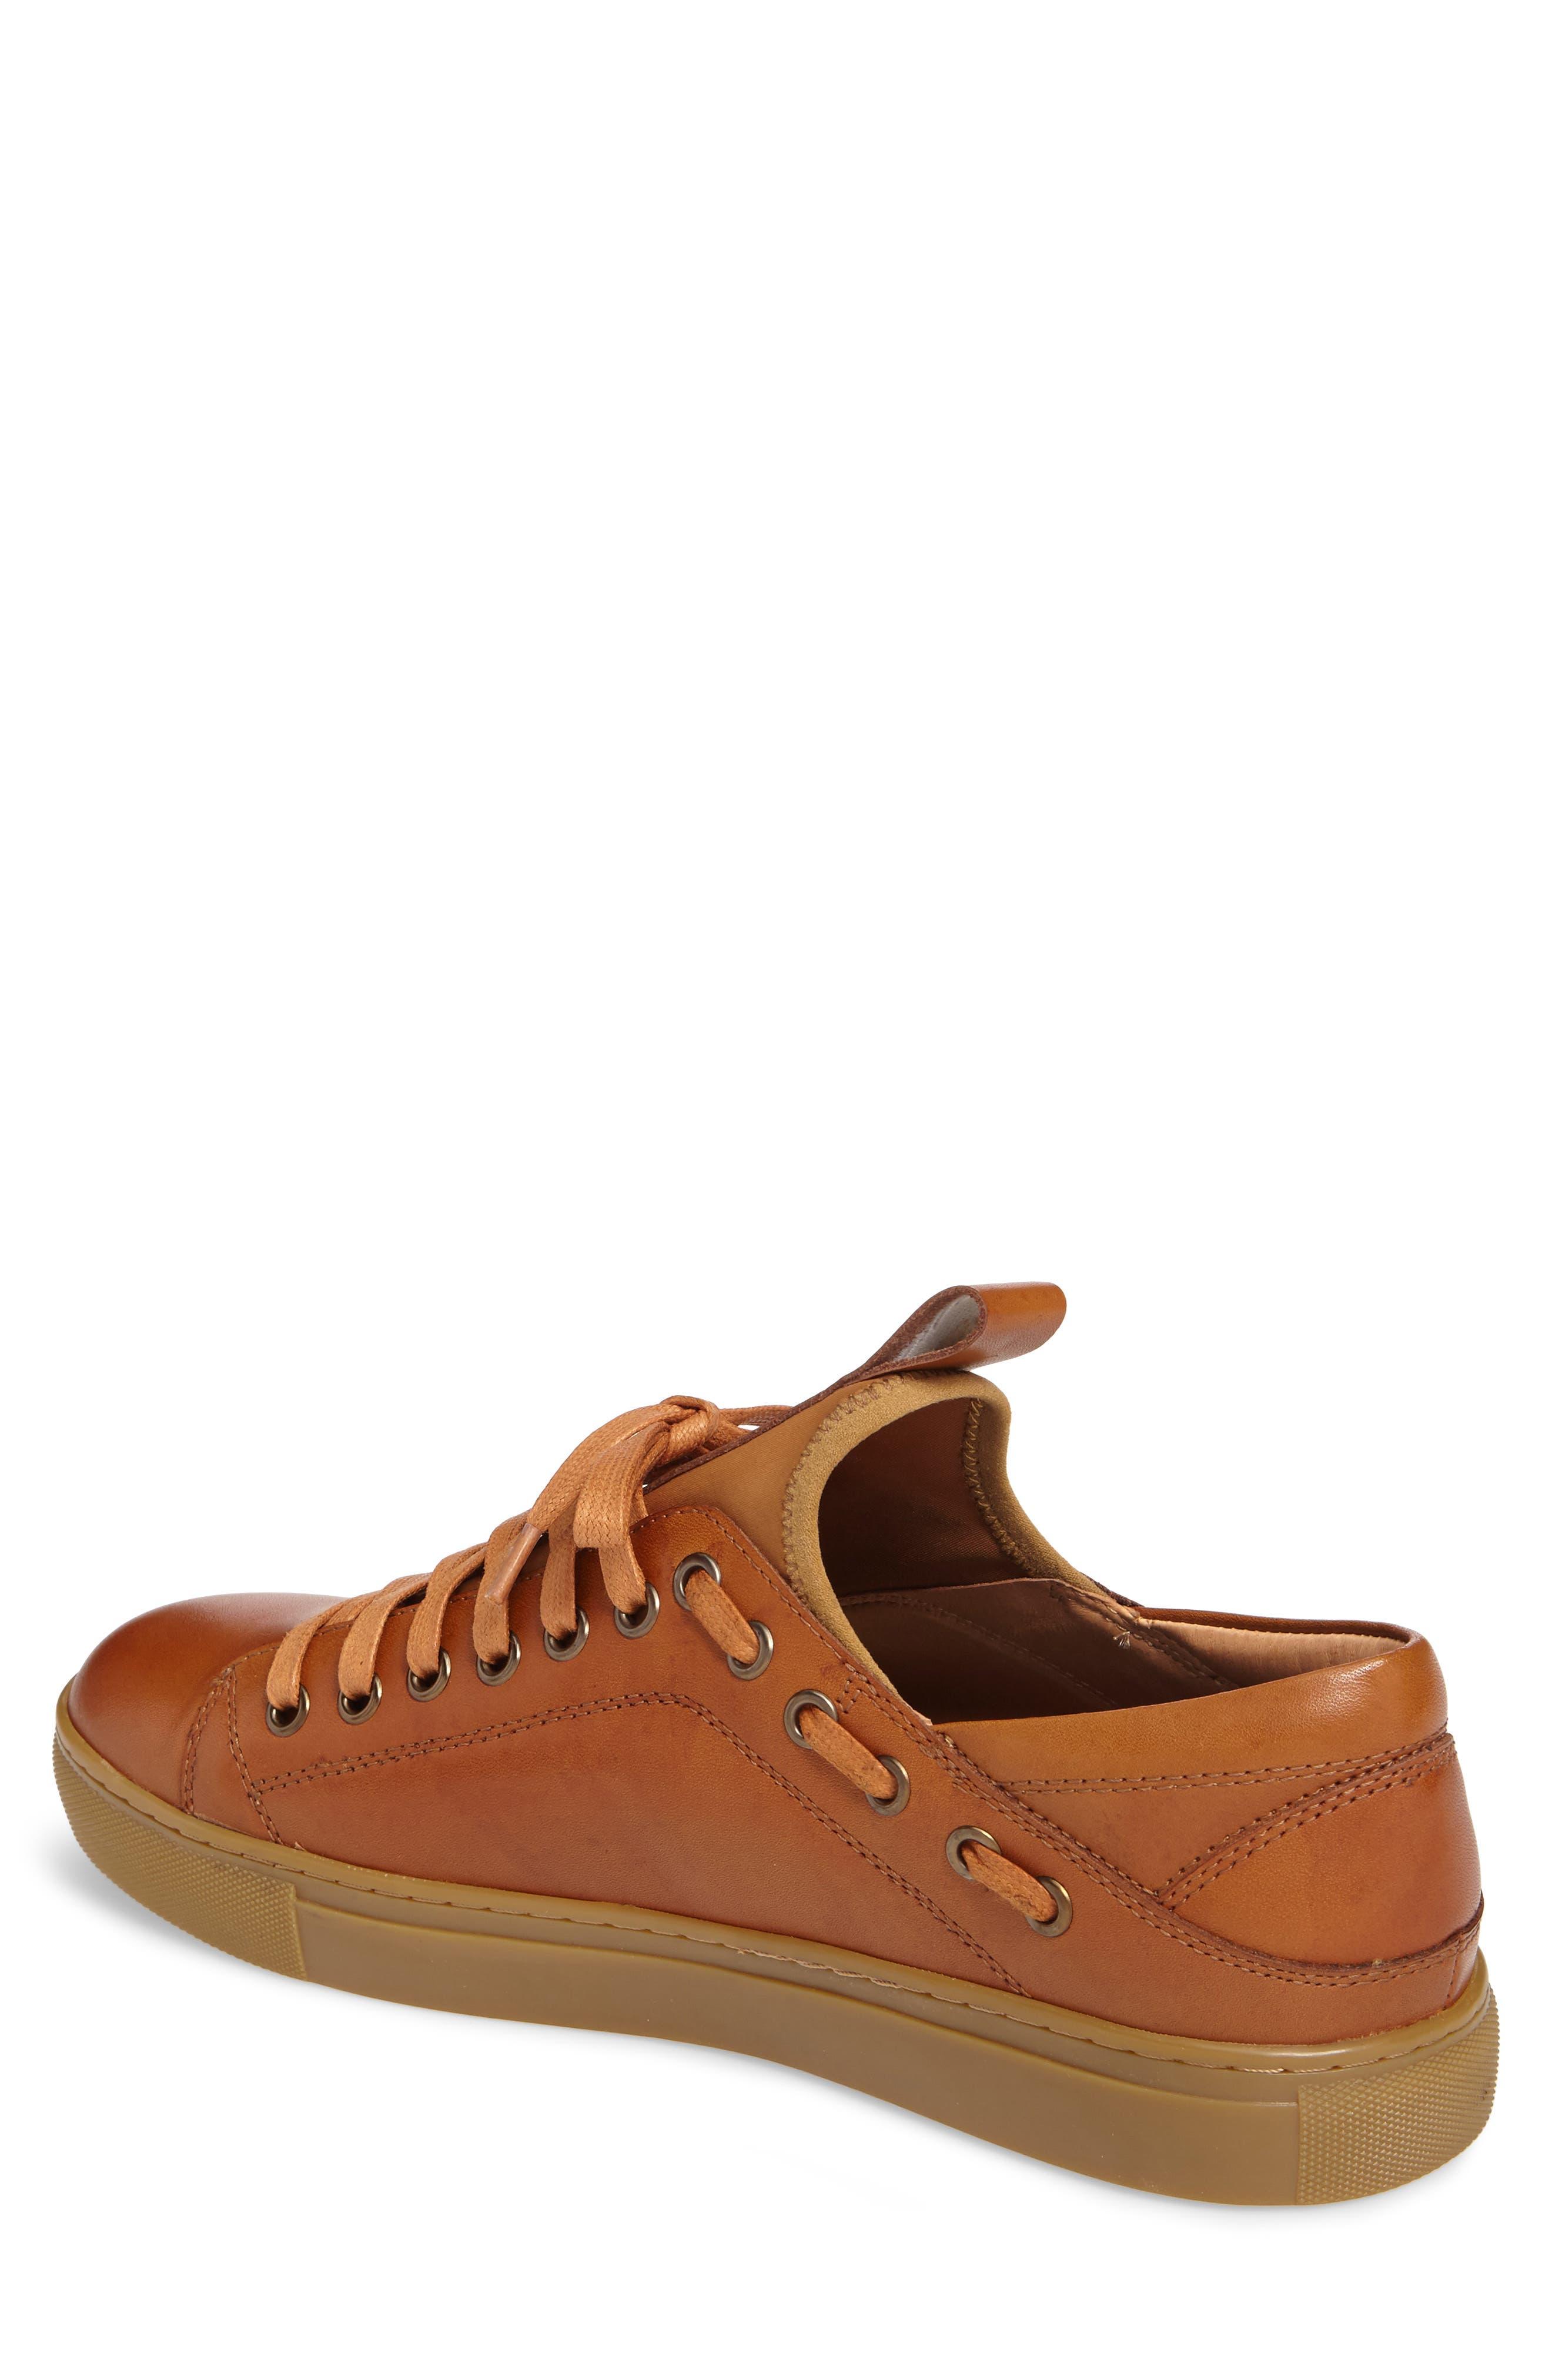 Owen Sneaker,                             Alternate thumbnail 4, color,